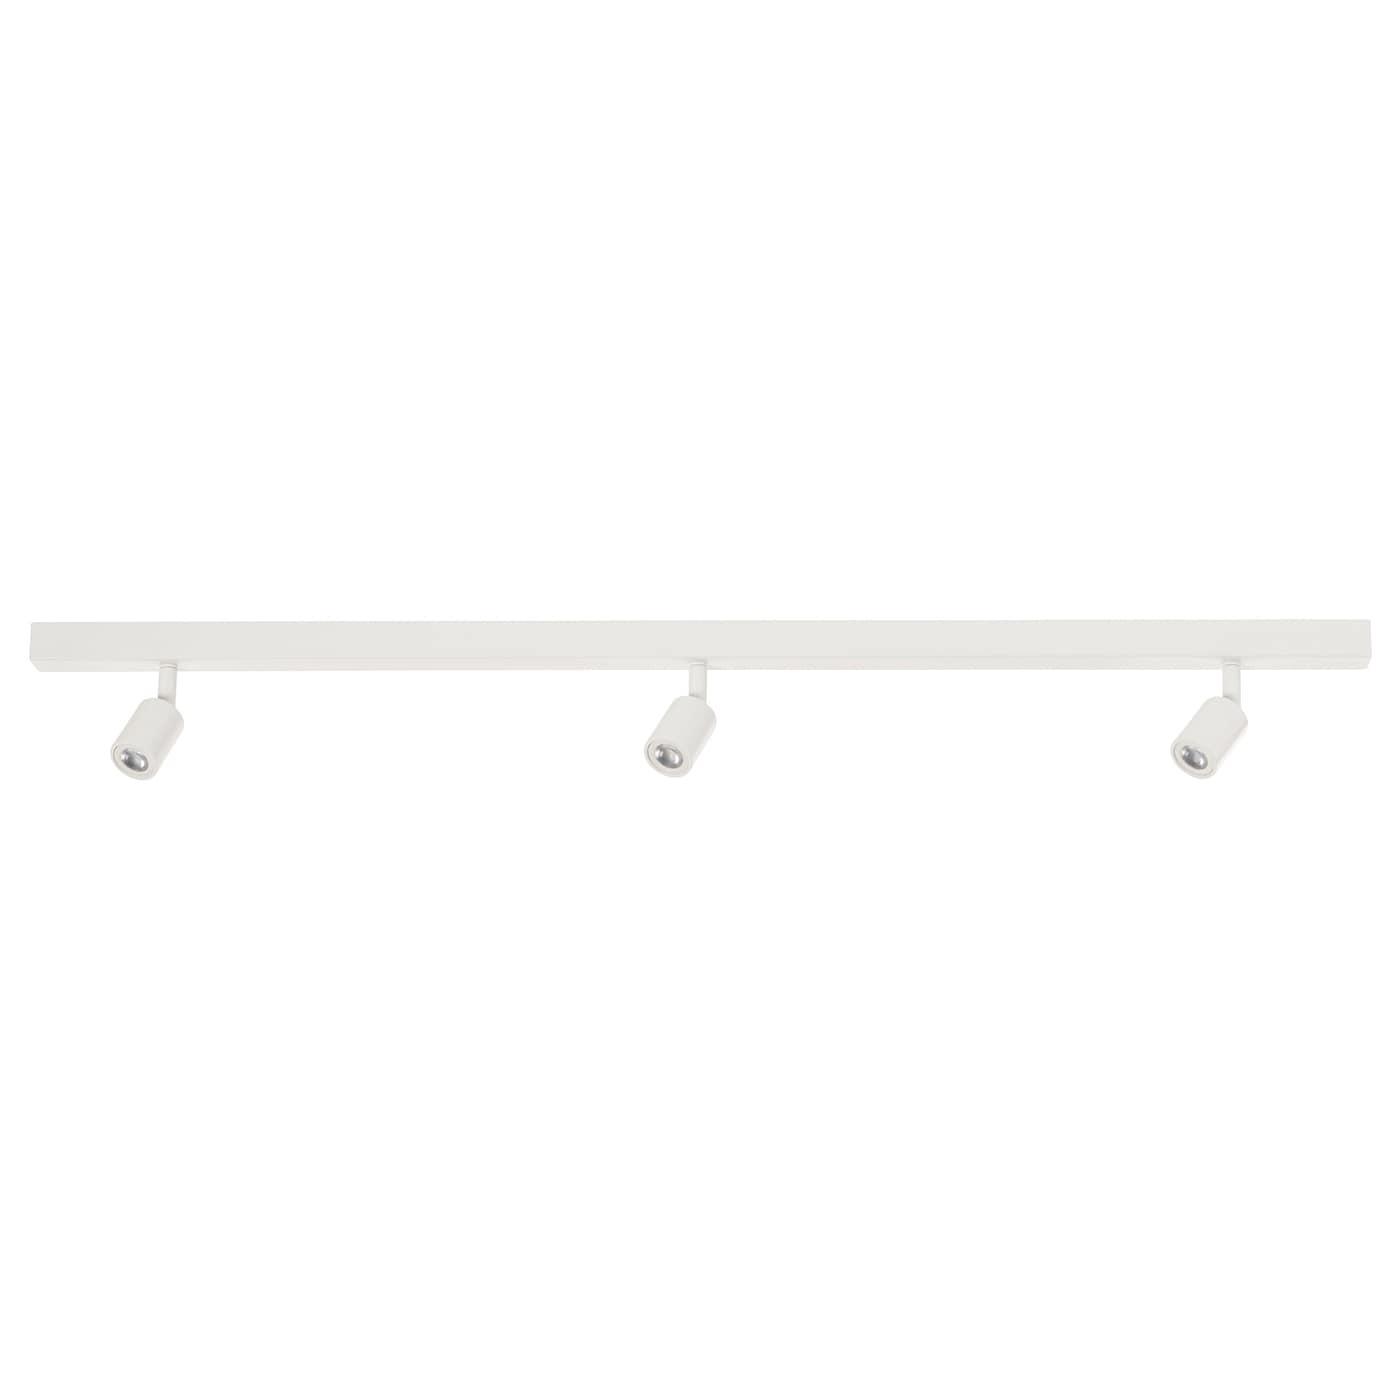 IKEA BÄVE Lampa sufitowa LED, 3 reflektory, biały